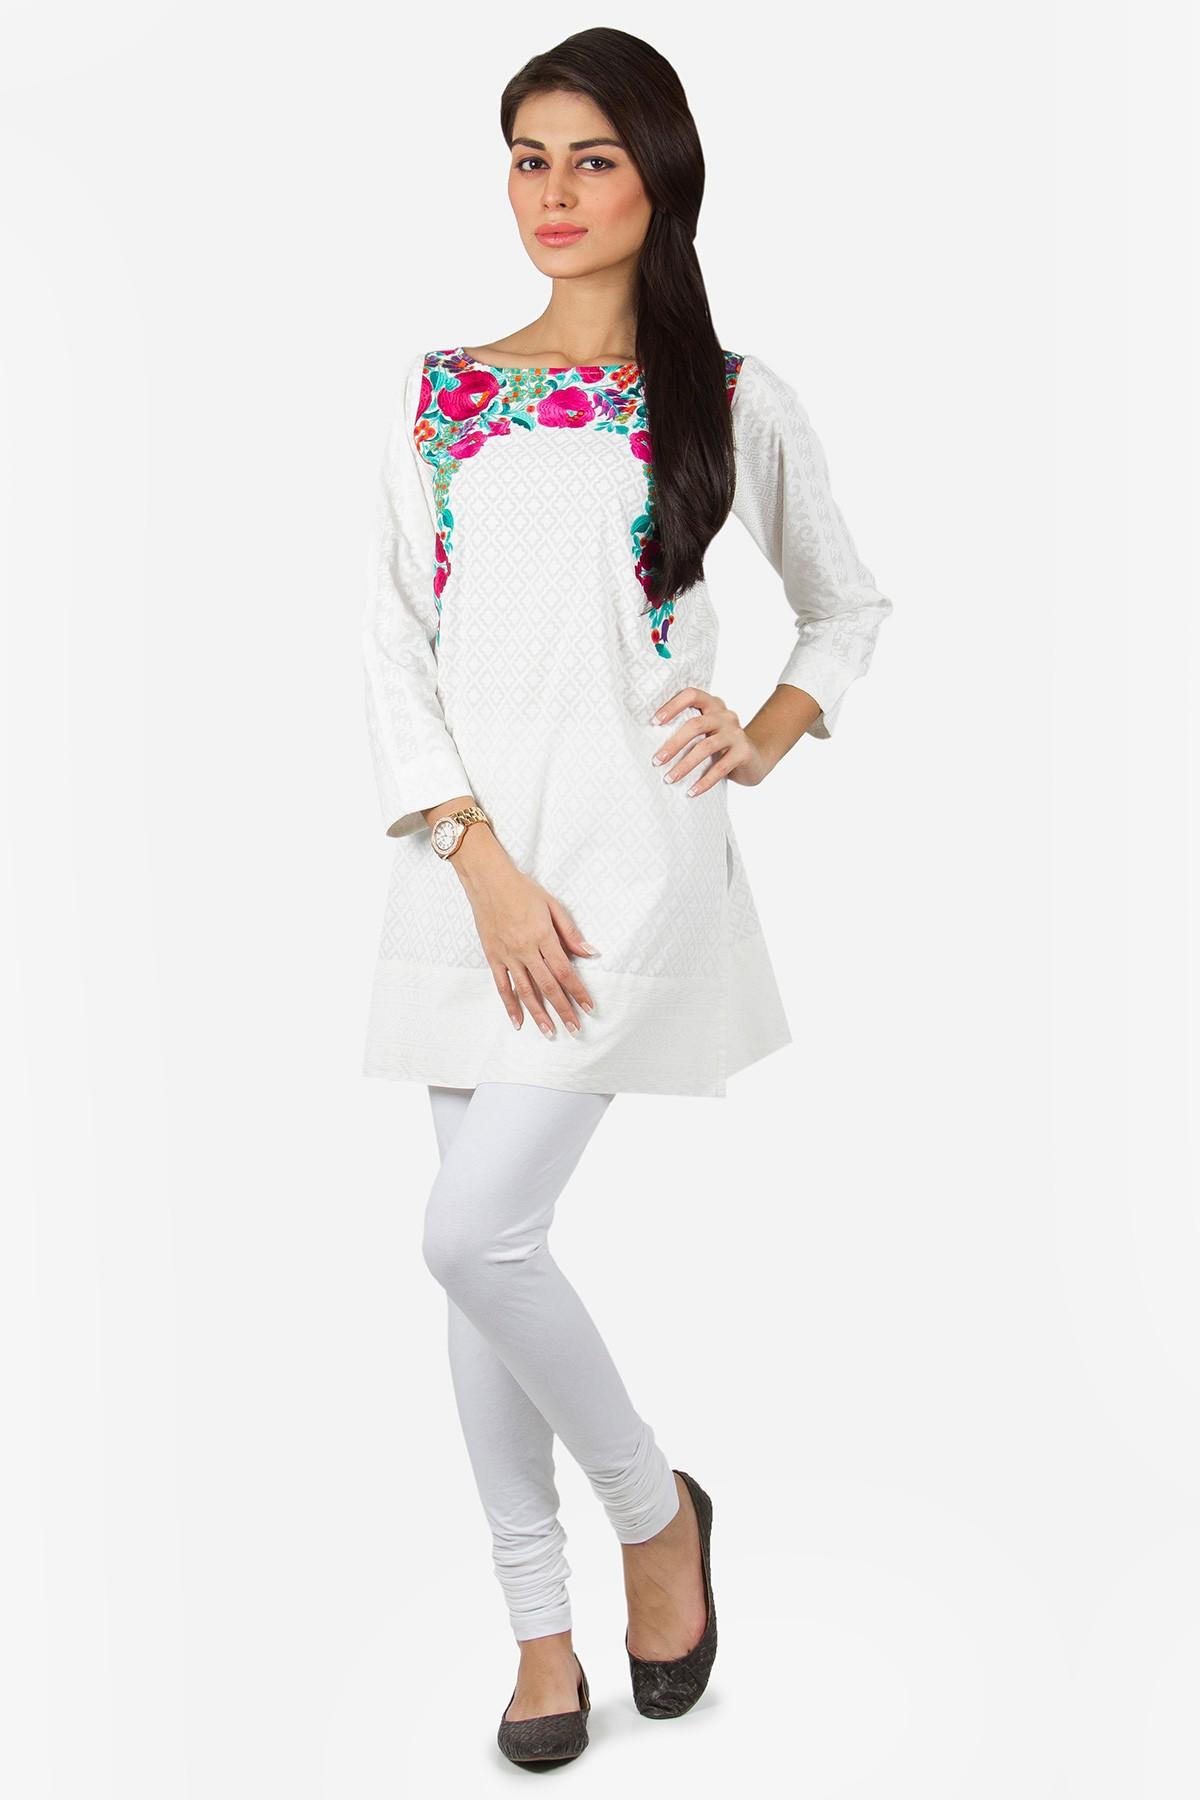 latest-kurta-styles-for-girls-2014